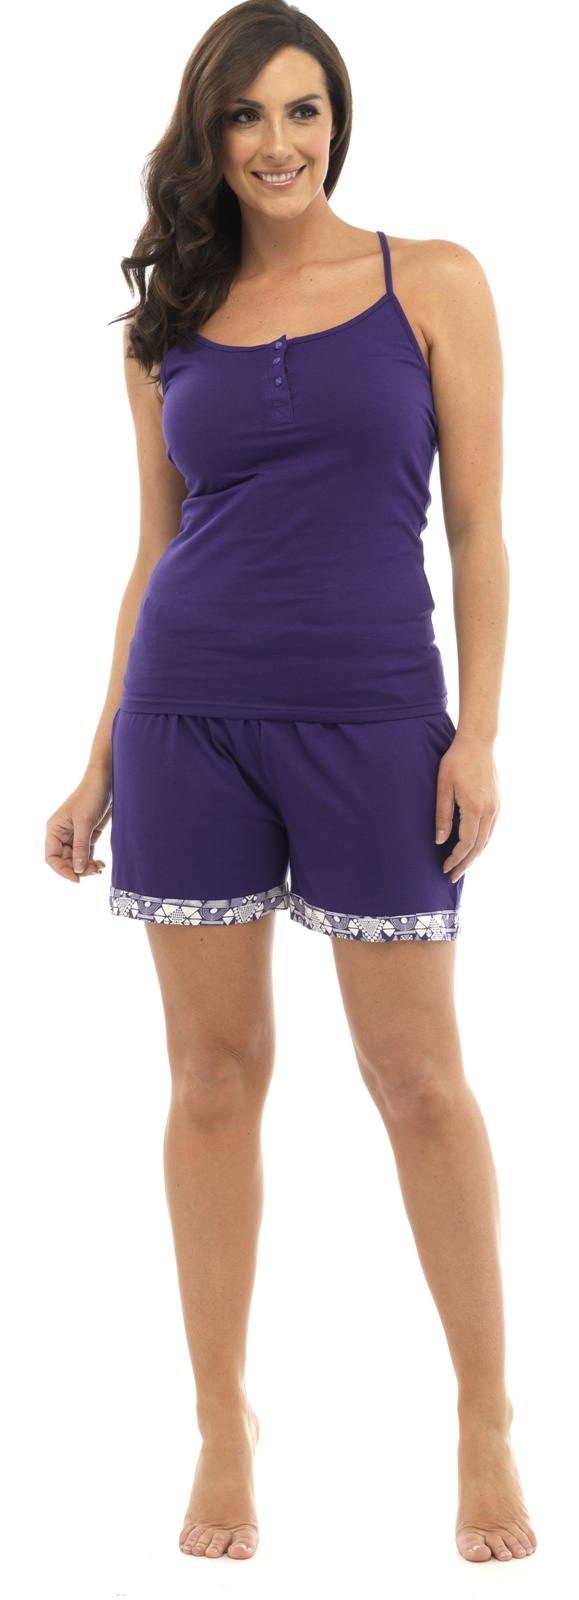 womens pyjamas 2 piece set nightwear vest top shorts. Black Bedroom Furniture Sets. Home Design Ideas